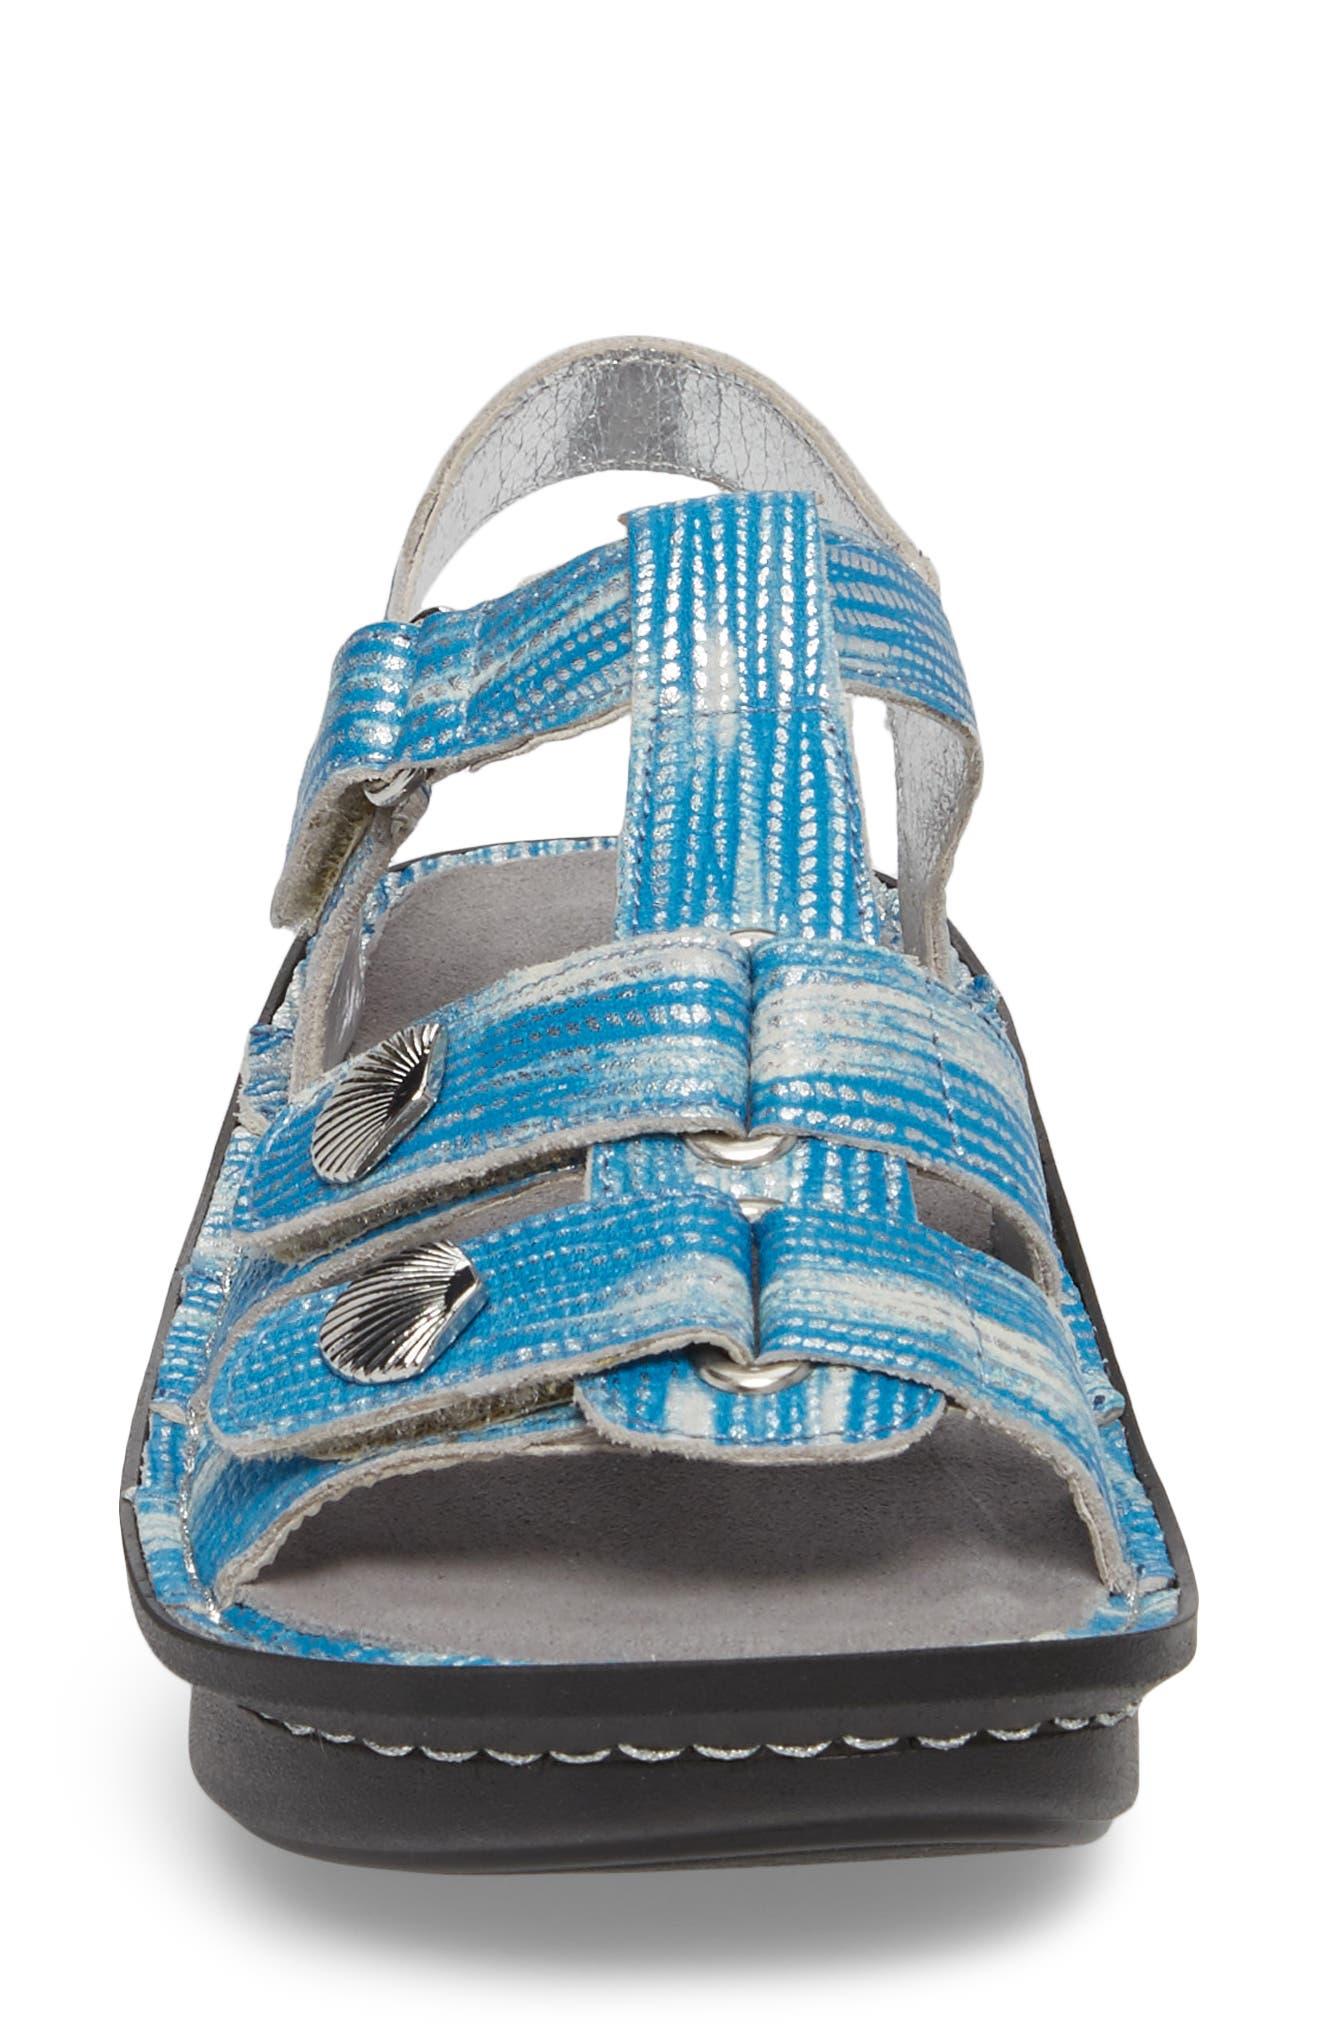 'Kleo' Sandal,                             Alternate thumbnail 4, color,                             Wrapture Blues Leather